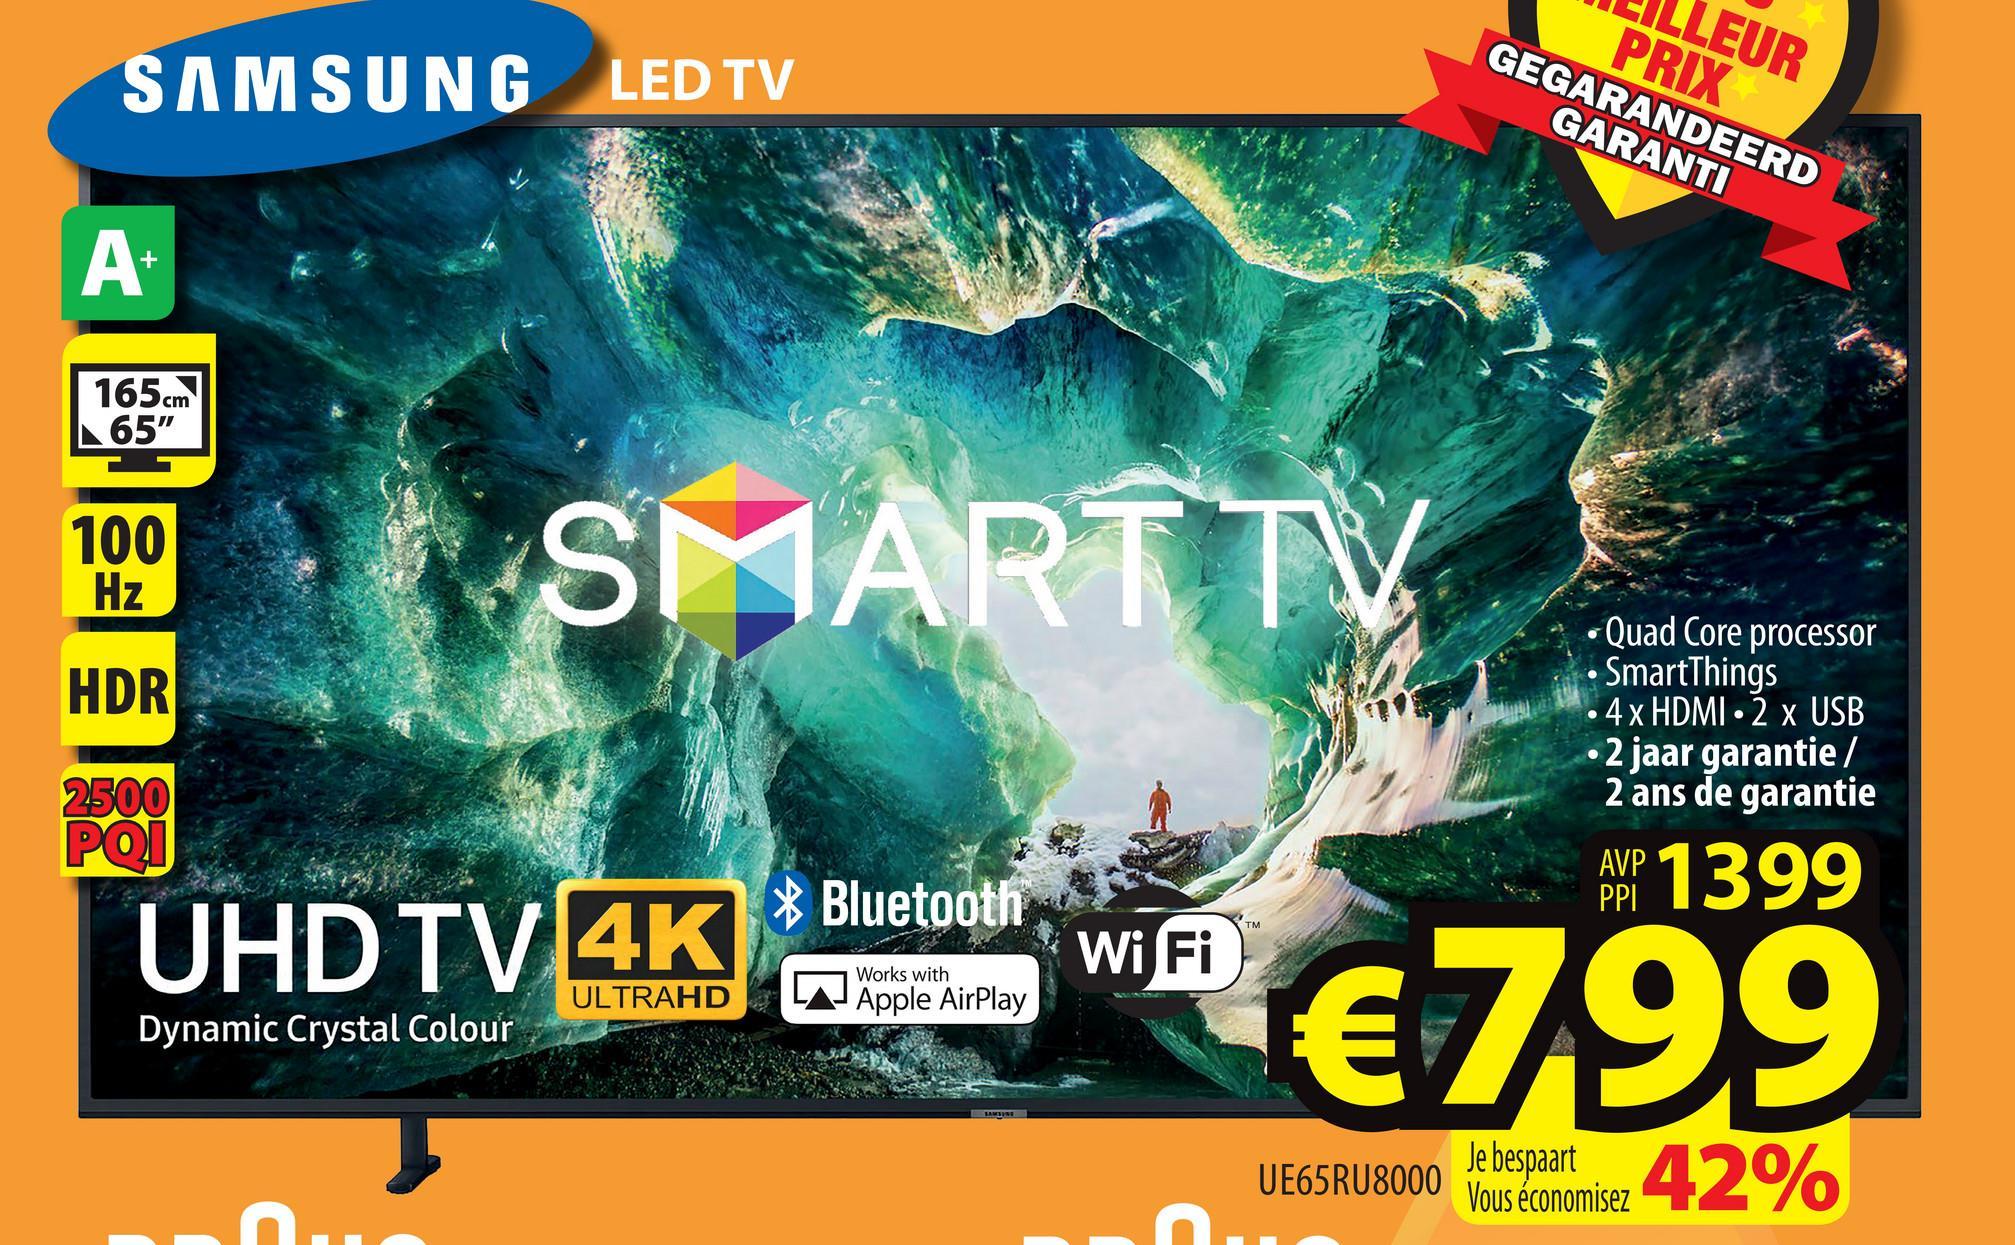 "LILLEUR PRIX GEGARANDEERD GARANTI SAMSUNG LED TV 165 cm 65"" 100 Hz HDR hot SMART TV UHDTVAK) 3 € 799 • Quad Core processor • SmartThings • 4x HDMI - 2 x USB • 2 jaar garantie / 2 ans de garantie 2500 ΡΟΙ AMP 1399 * Bluetooth UHD TV 14K Wi Fi Works with ULTRAHD LAJ Apple AirPlay Dynamic Crystal Colour UE65RU8000 Je bespaart Vous économisez"